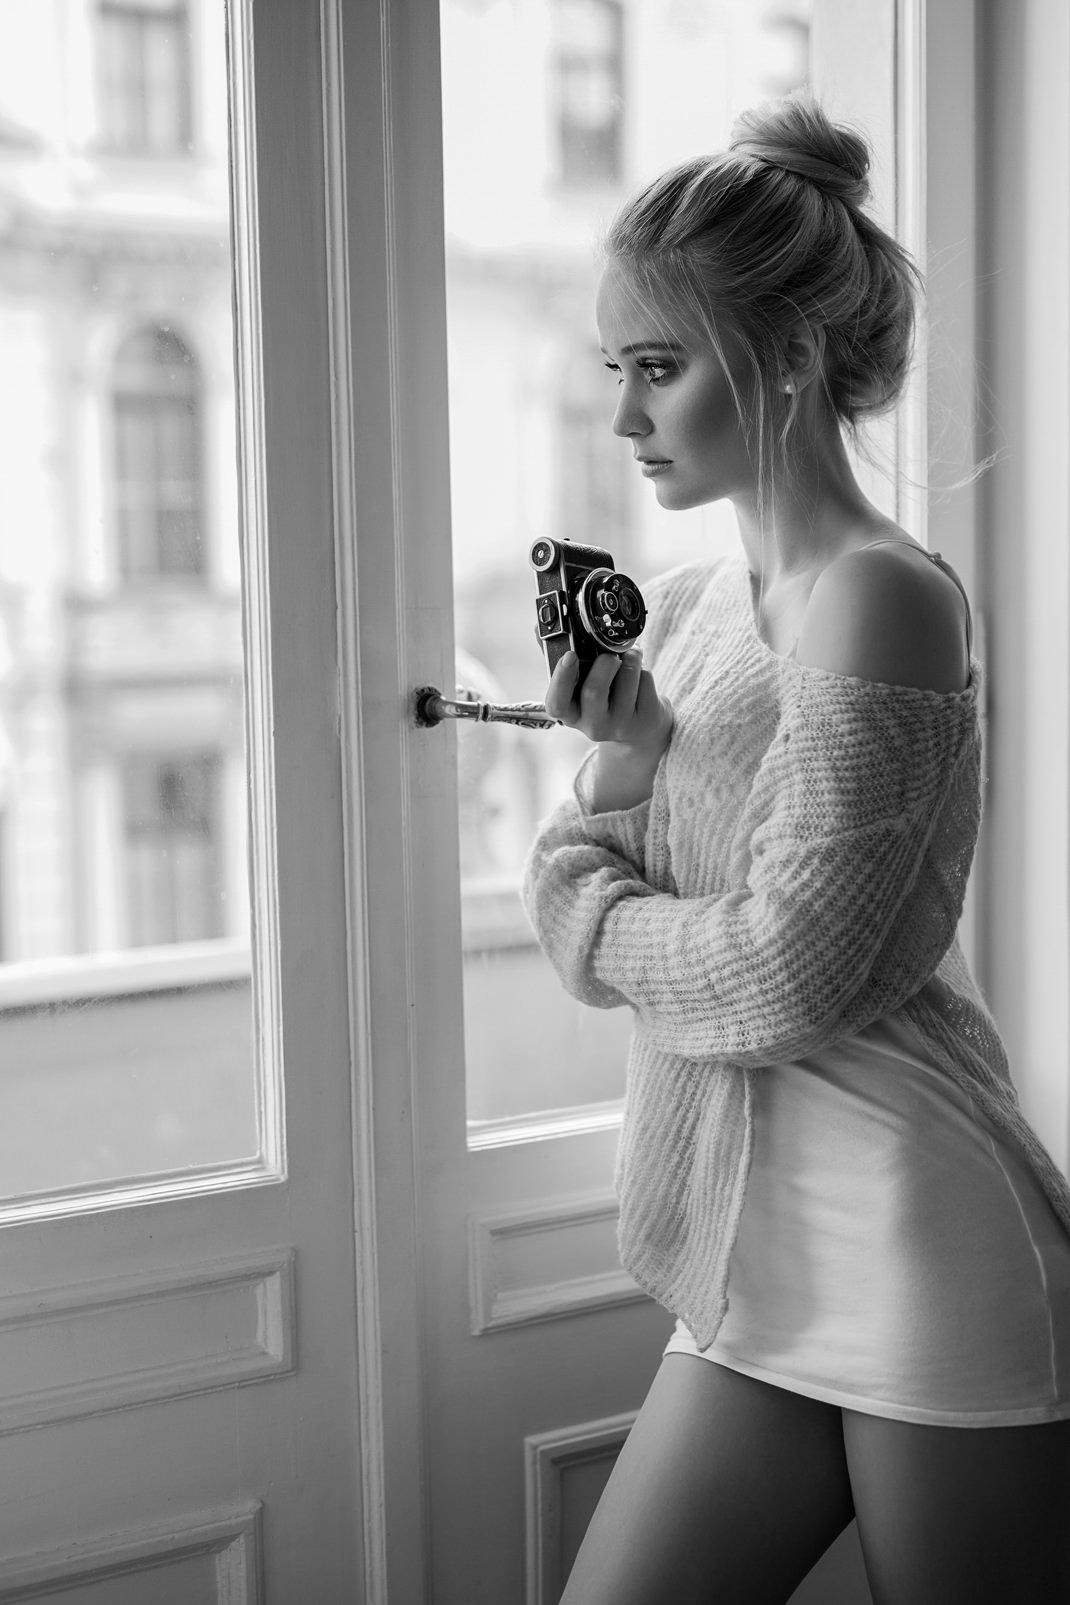 Two Beauties - Antonia & Ihagee Parvola - Markus Hertzsch - Camera - Girl -Window